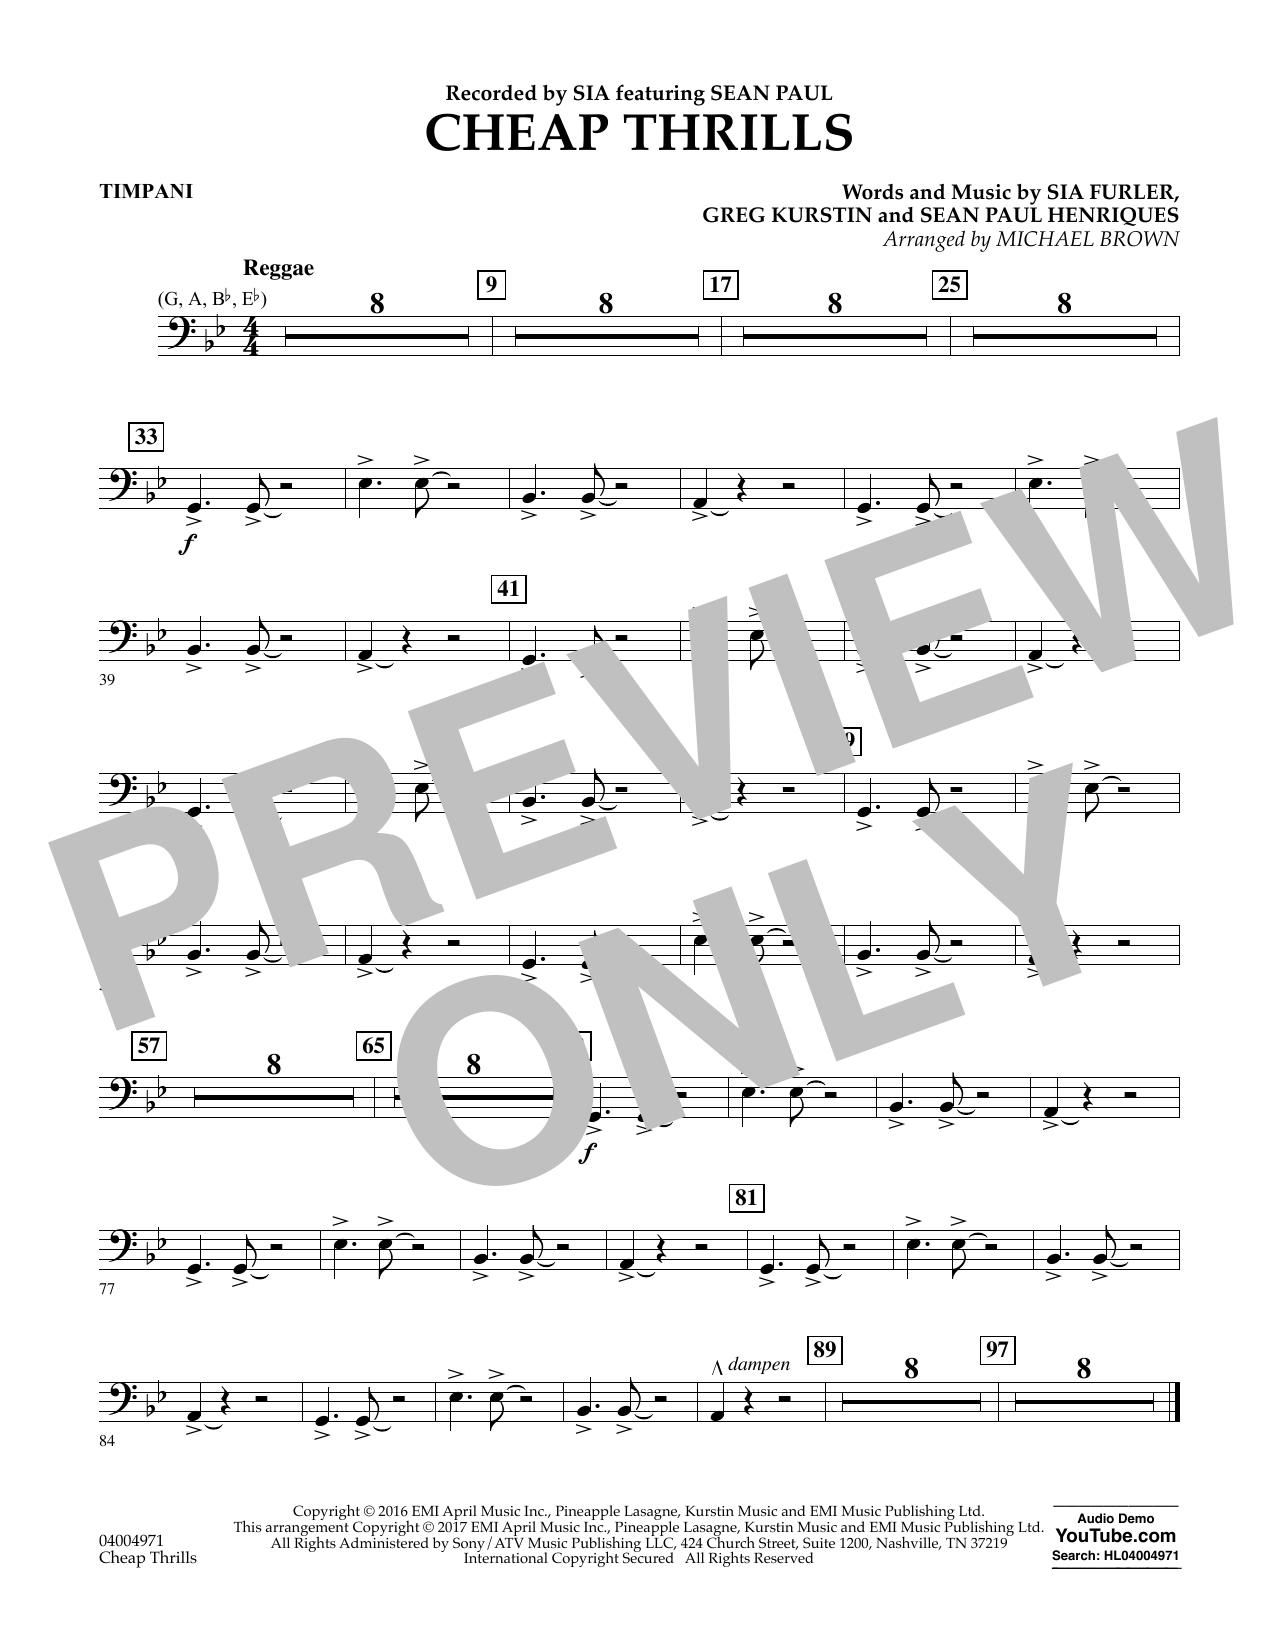 Cheap Thrills - Timpani Sheet Music